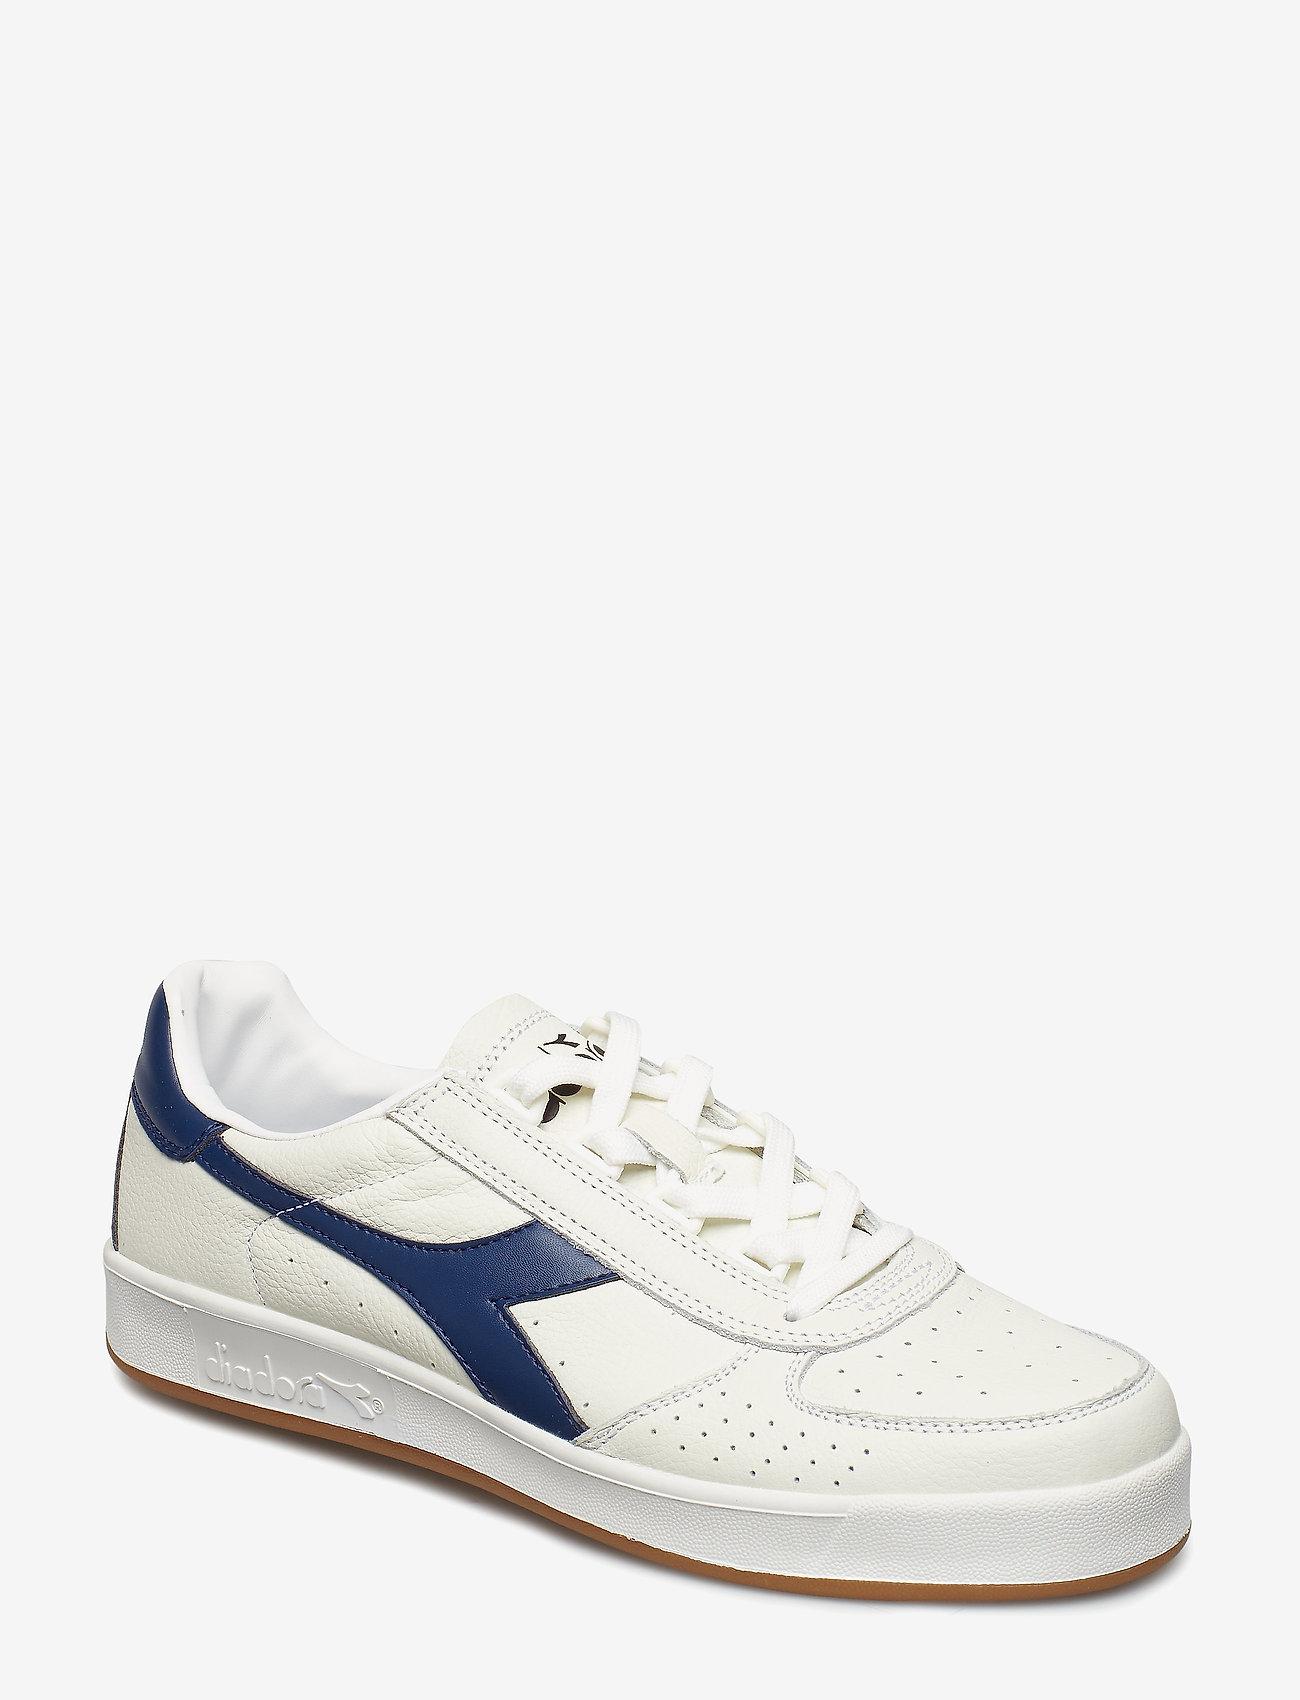 Diadora - B.ELITE L - baskets basses - white/ navy (c2816)